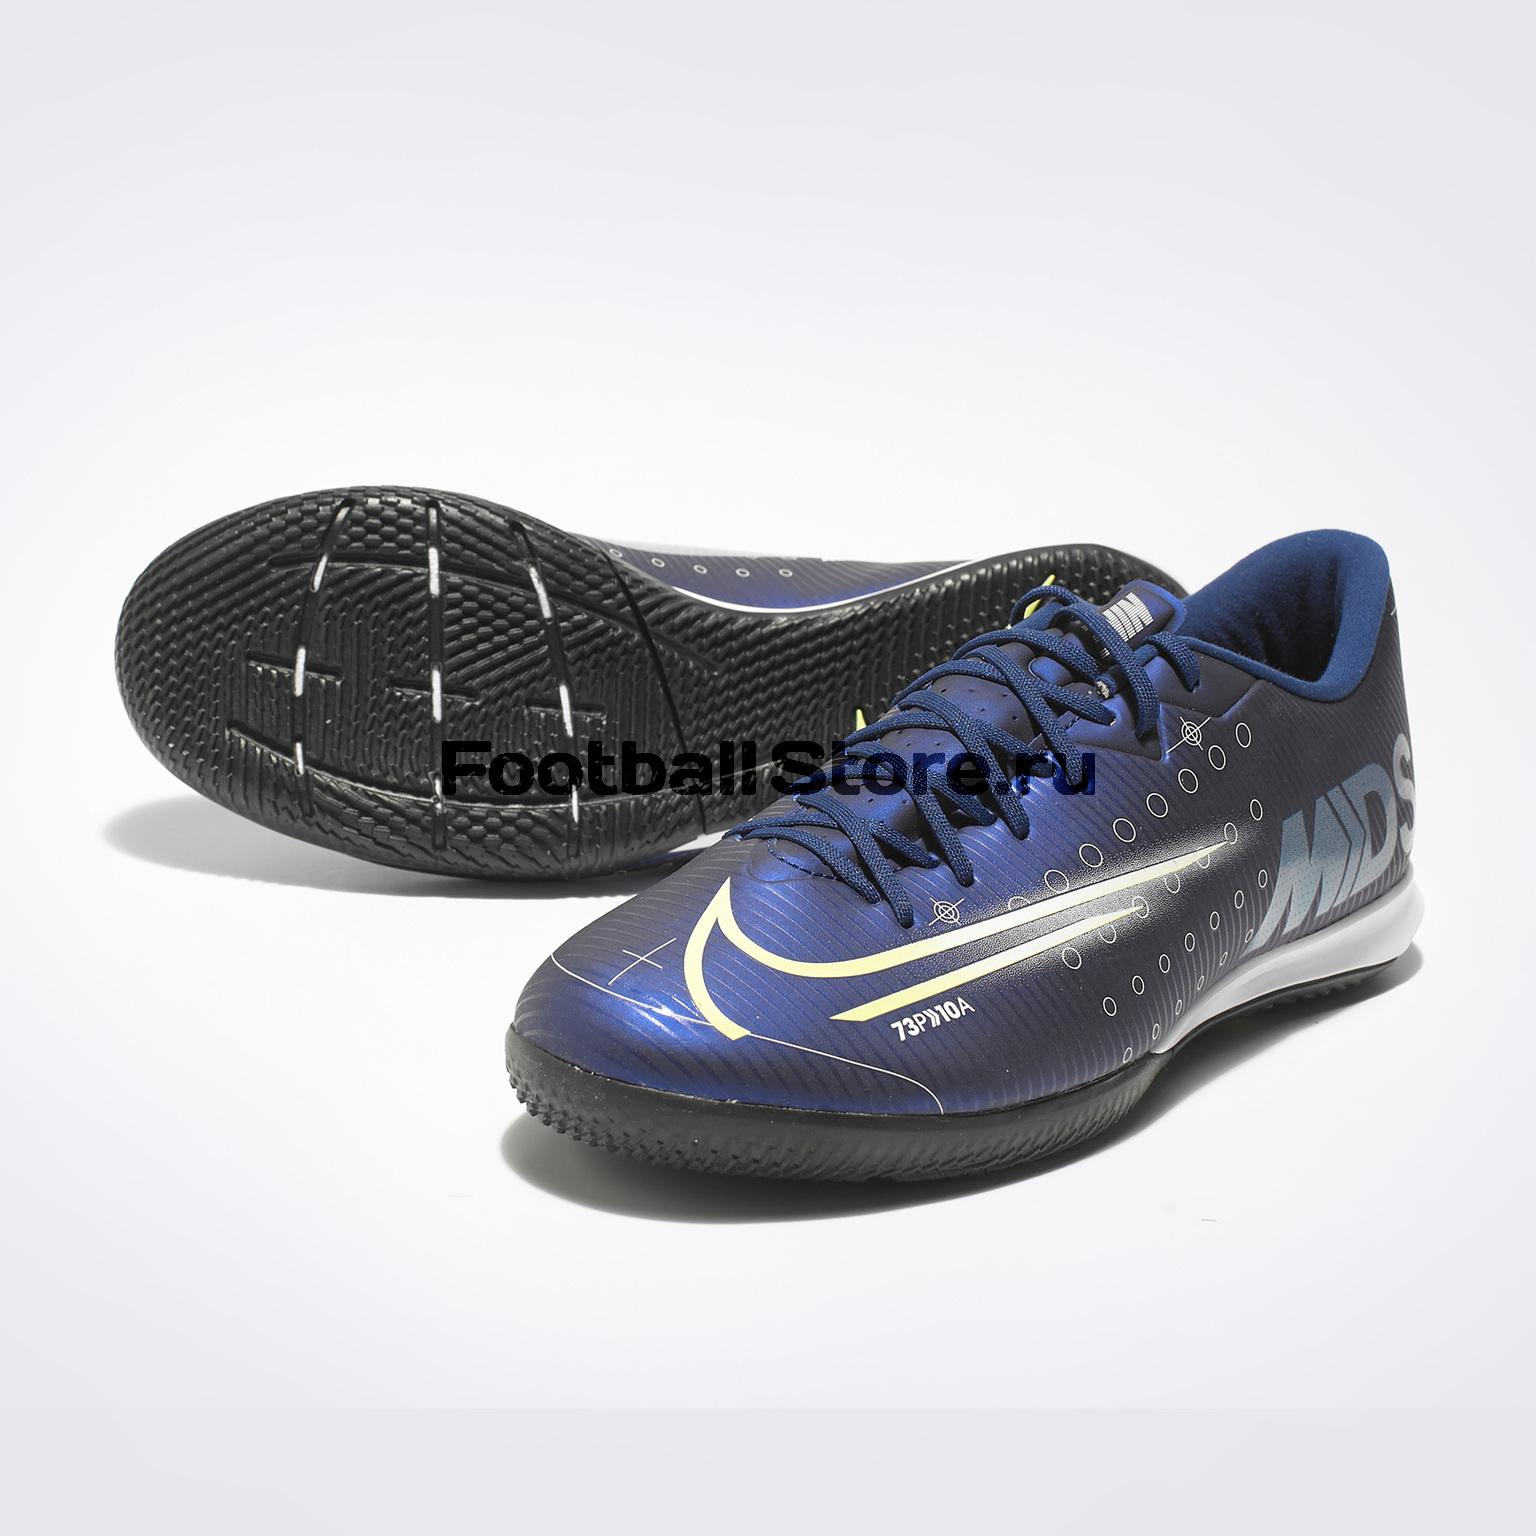 Футзалки Nike Vapor 13 Academy MDS IC CJ1300-401 обувь для зала nike vapor 12 academy neymar ic ao3122 710